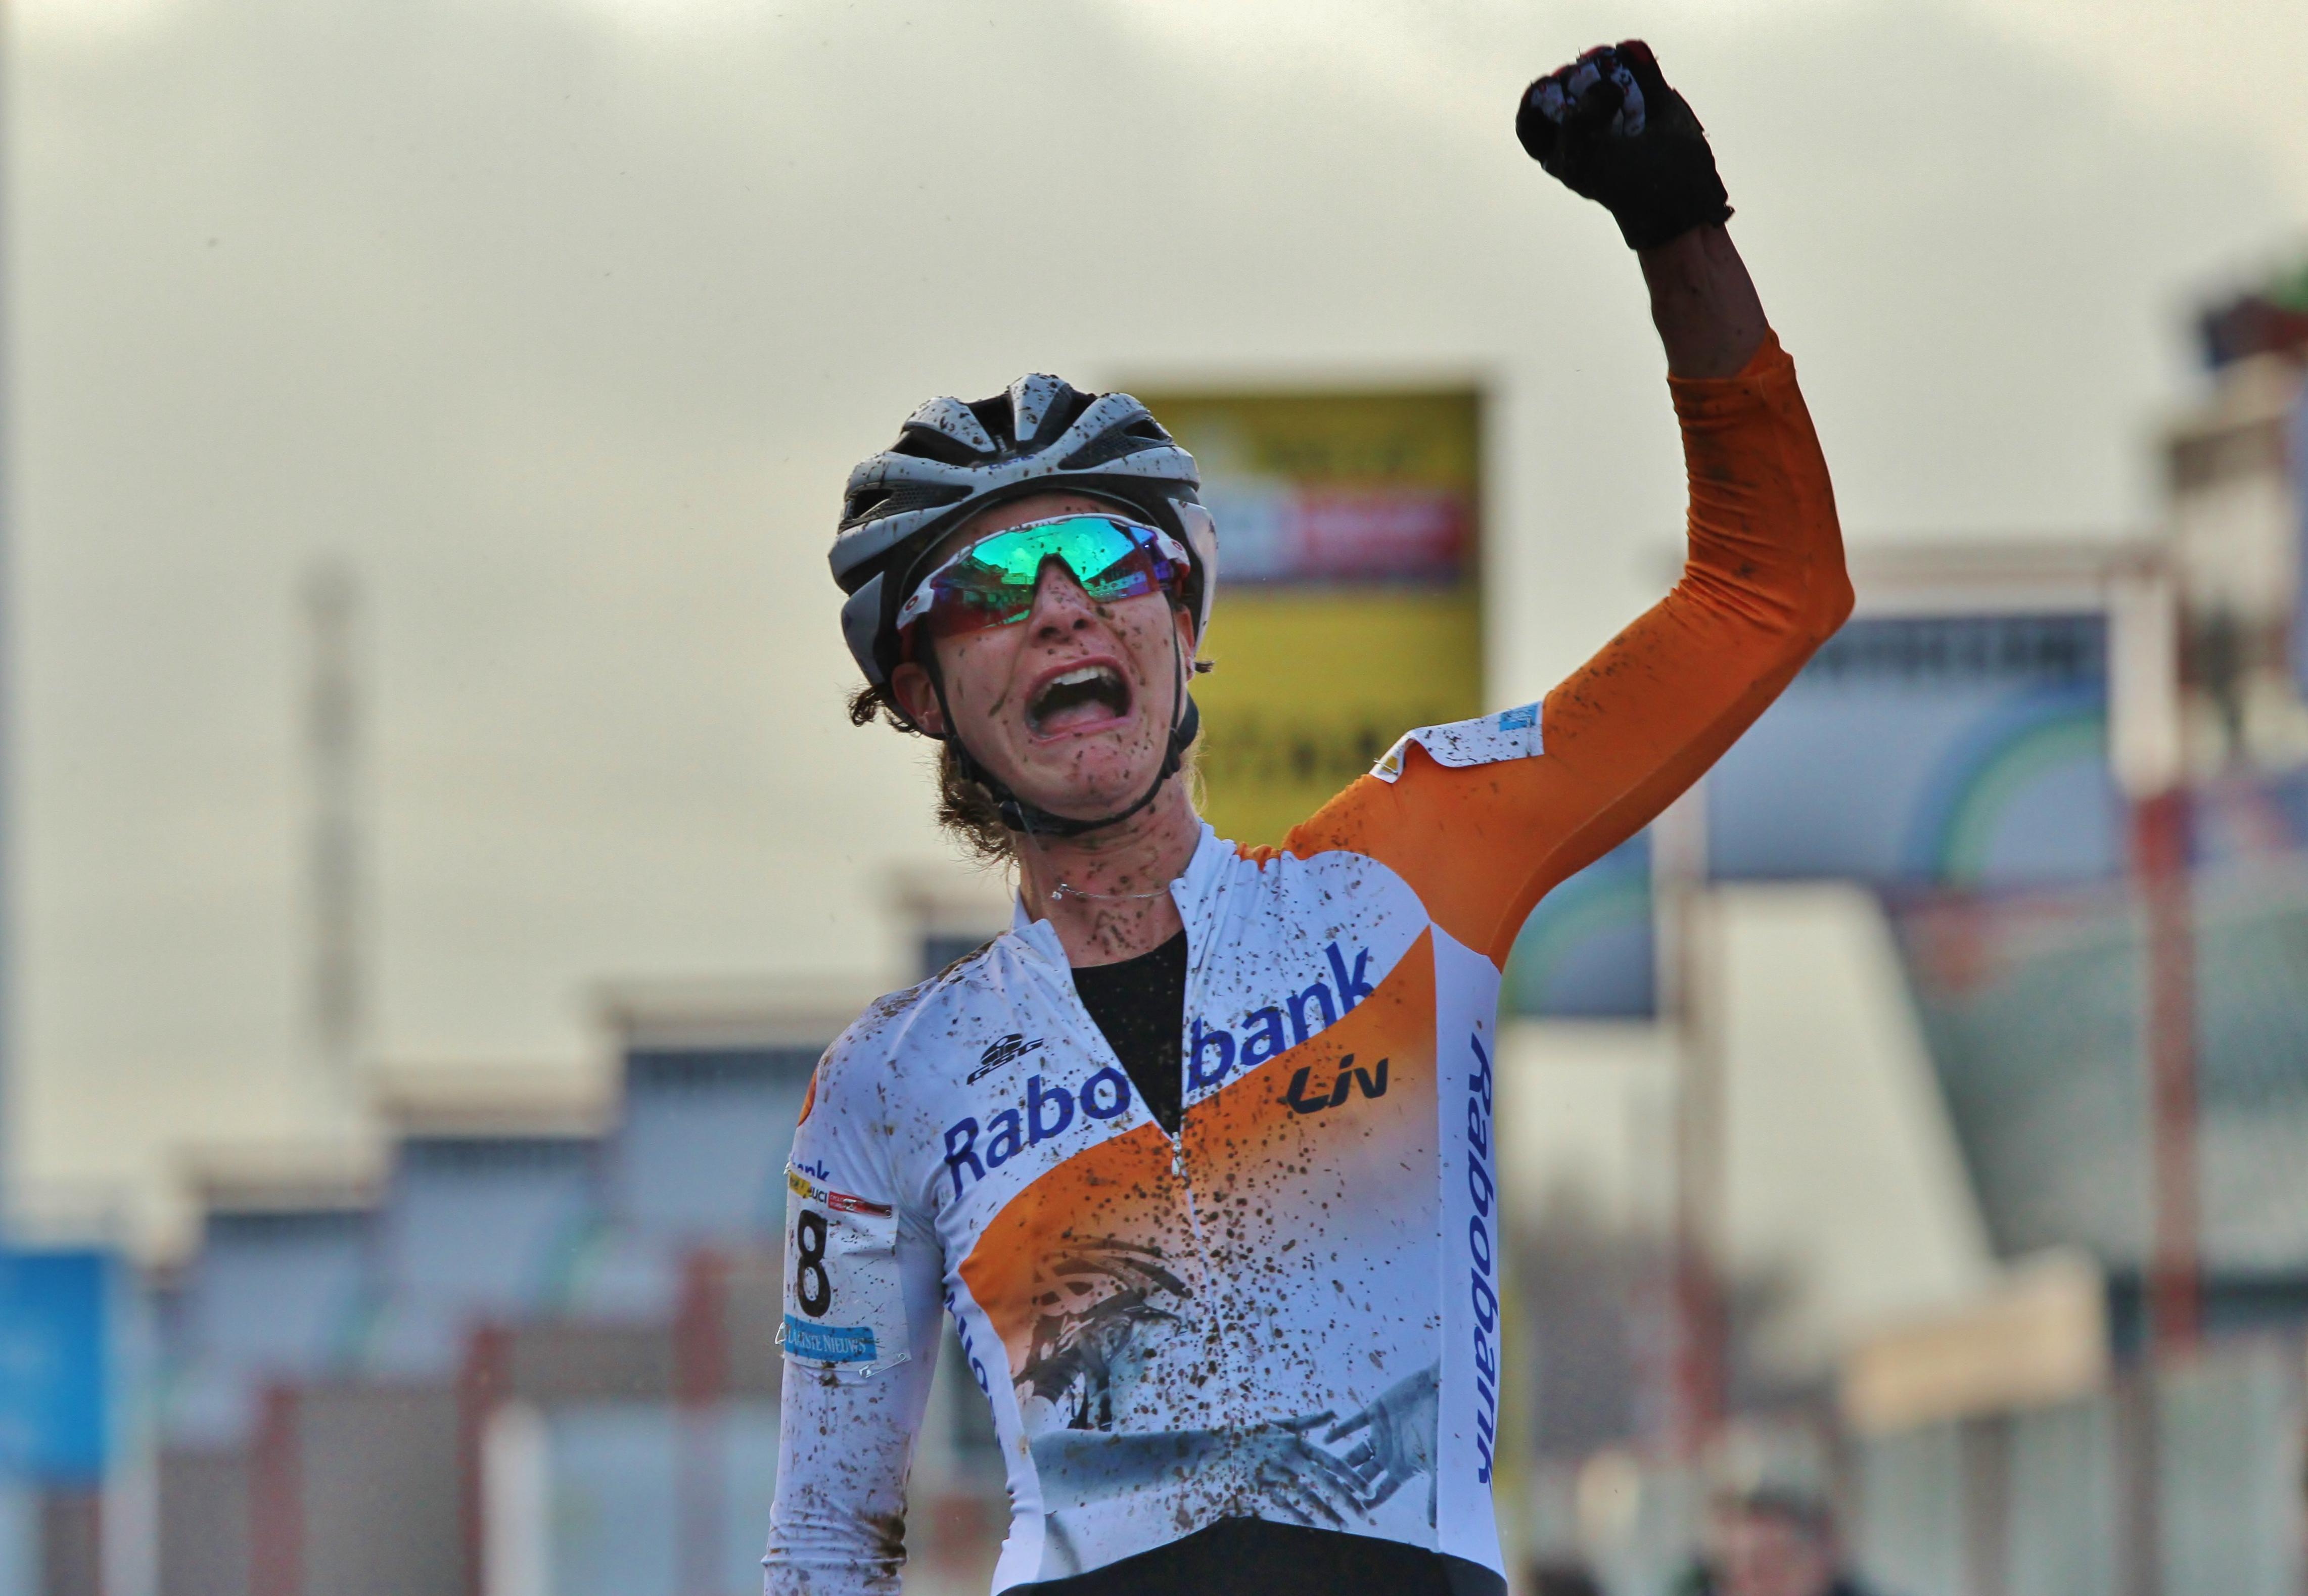 Nederland boven in Heusden – Zolder : Marianne Vos wint wereldbekermanche